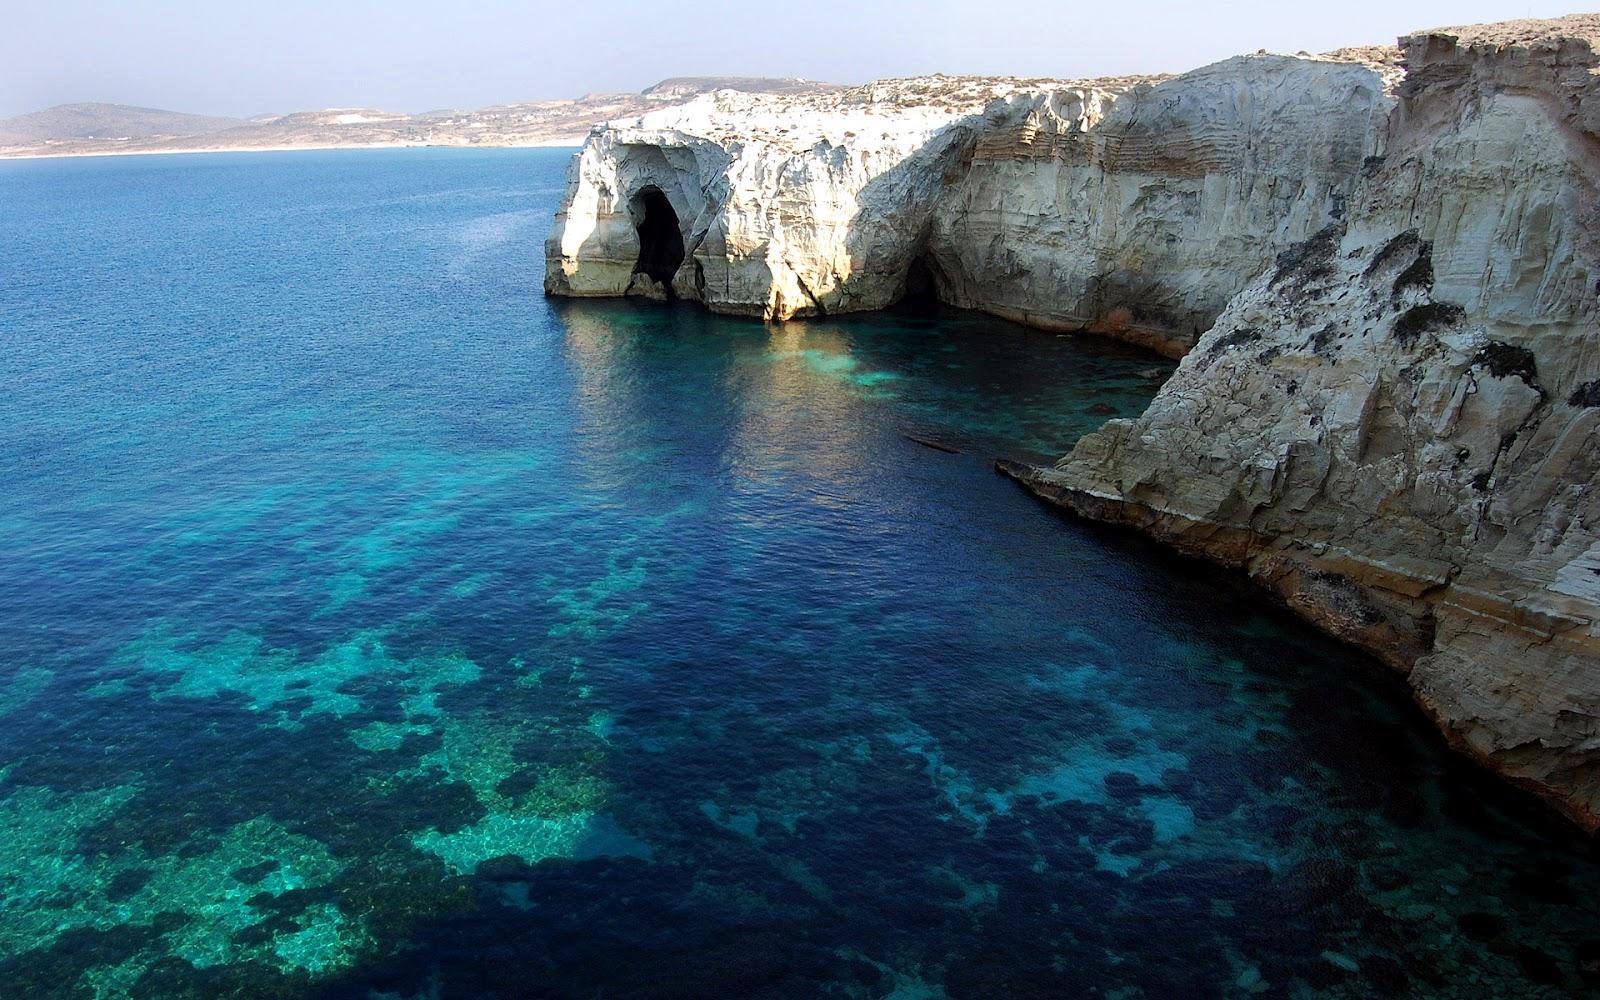 http://3.bp.blogspot.com/-Hi6bTEC99VQ/T4RWARSH8zI/AAAAAAAAA44/_IjsEaUKnac/s1600/wallpaper-152383_water-rocky-clear-greece.jpg